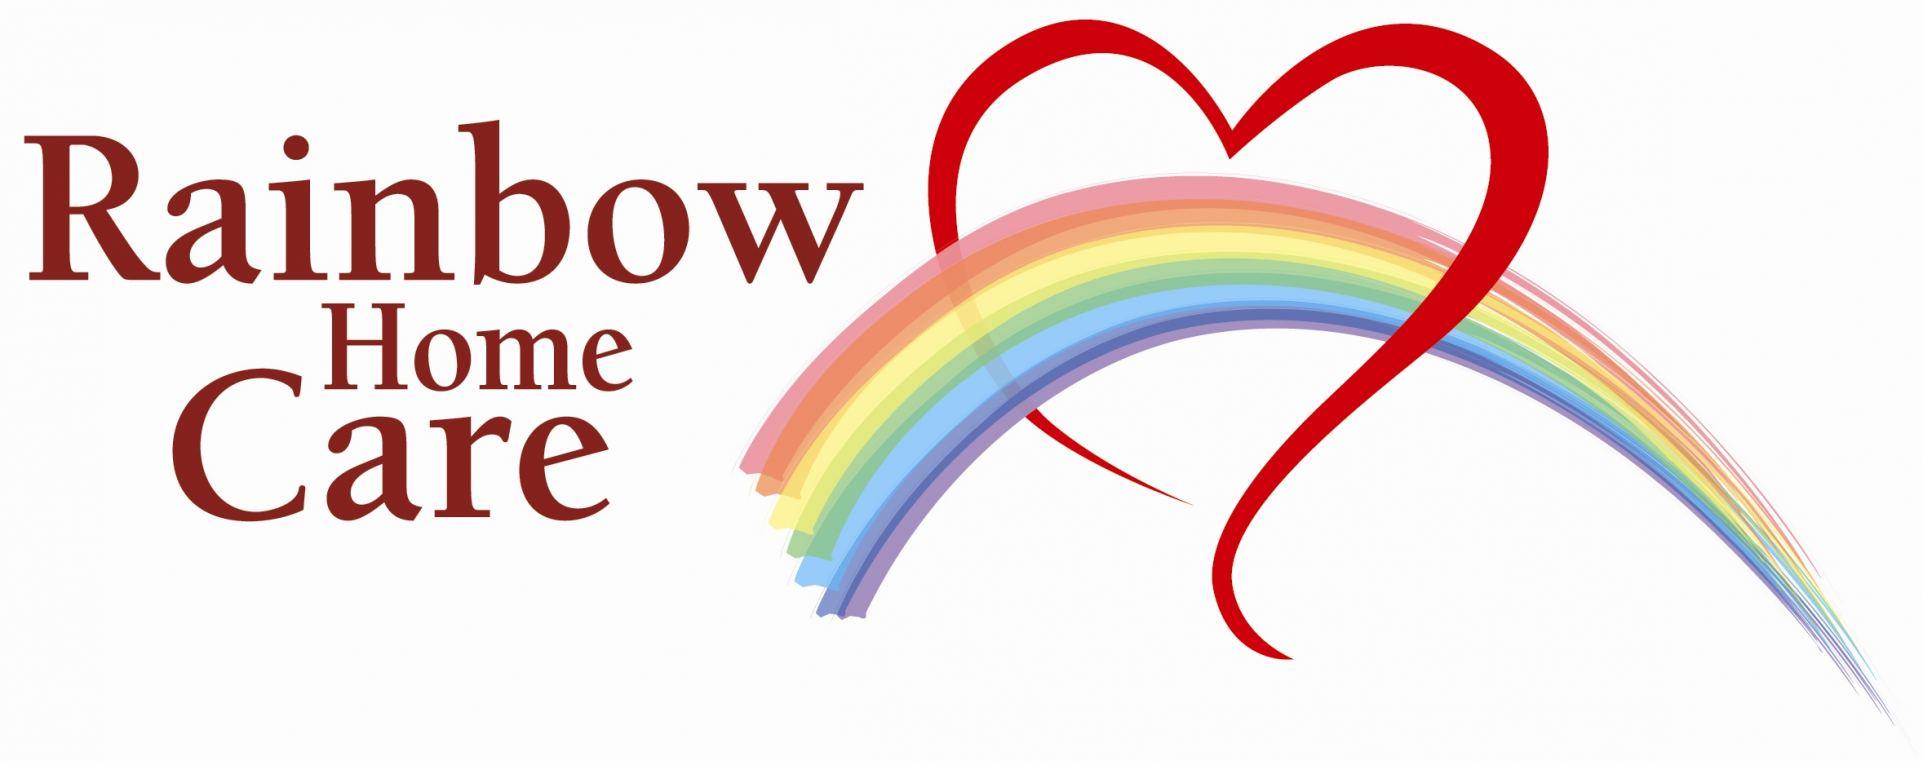 Rainbow Home Care Services, Inc. Logo